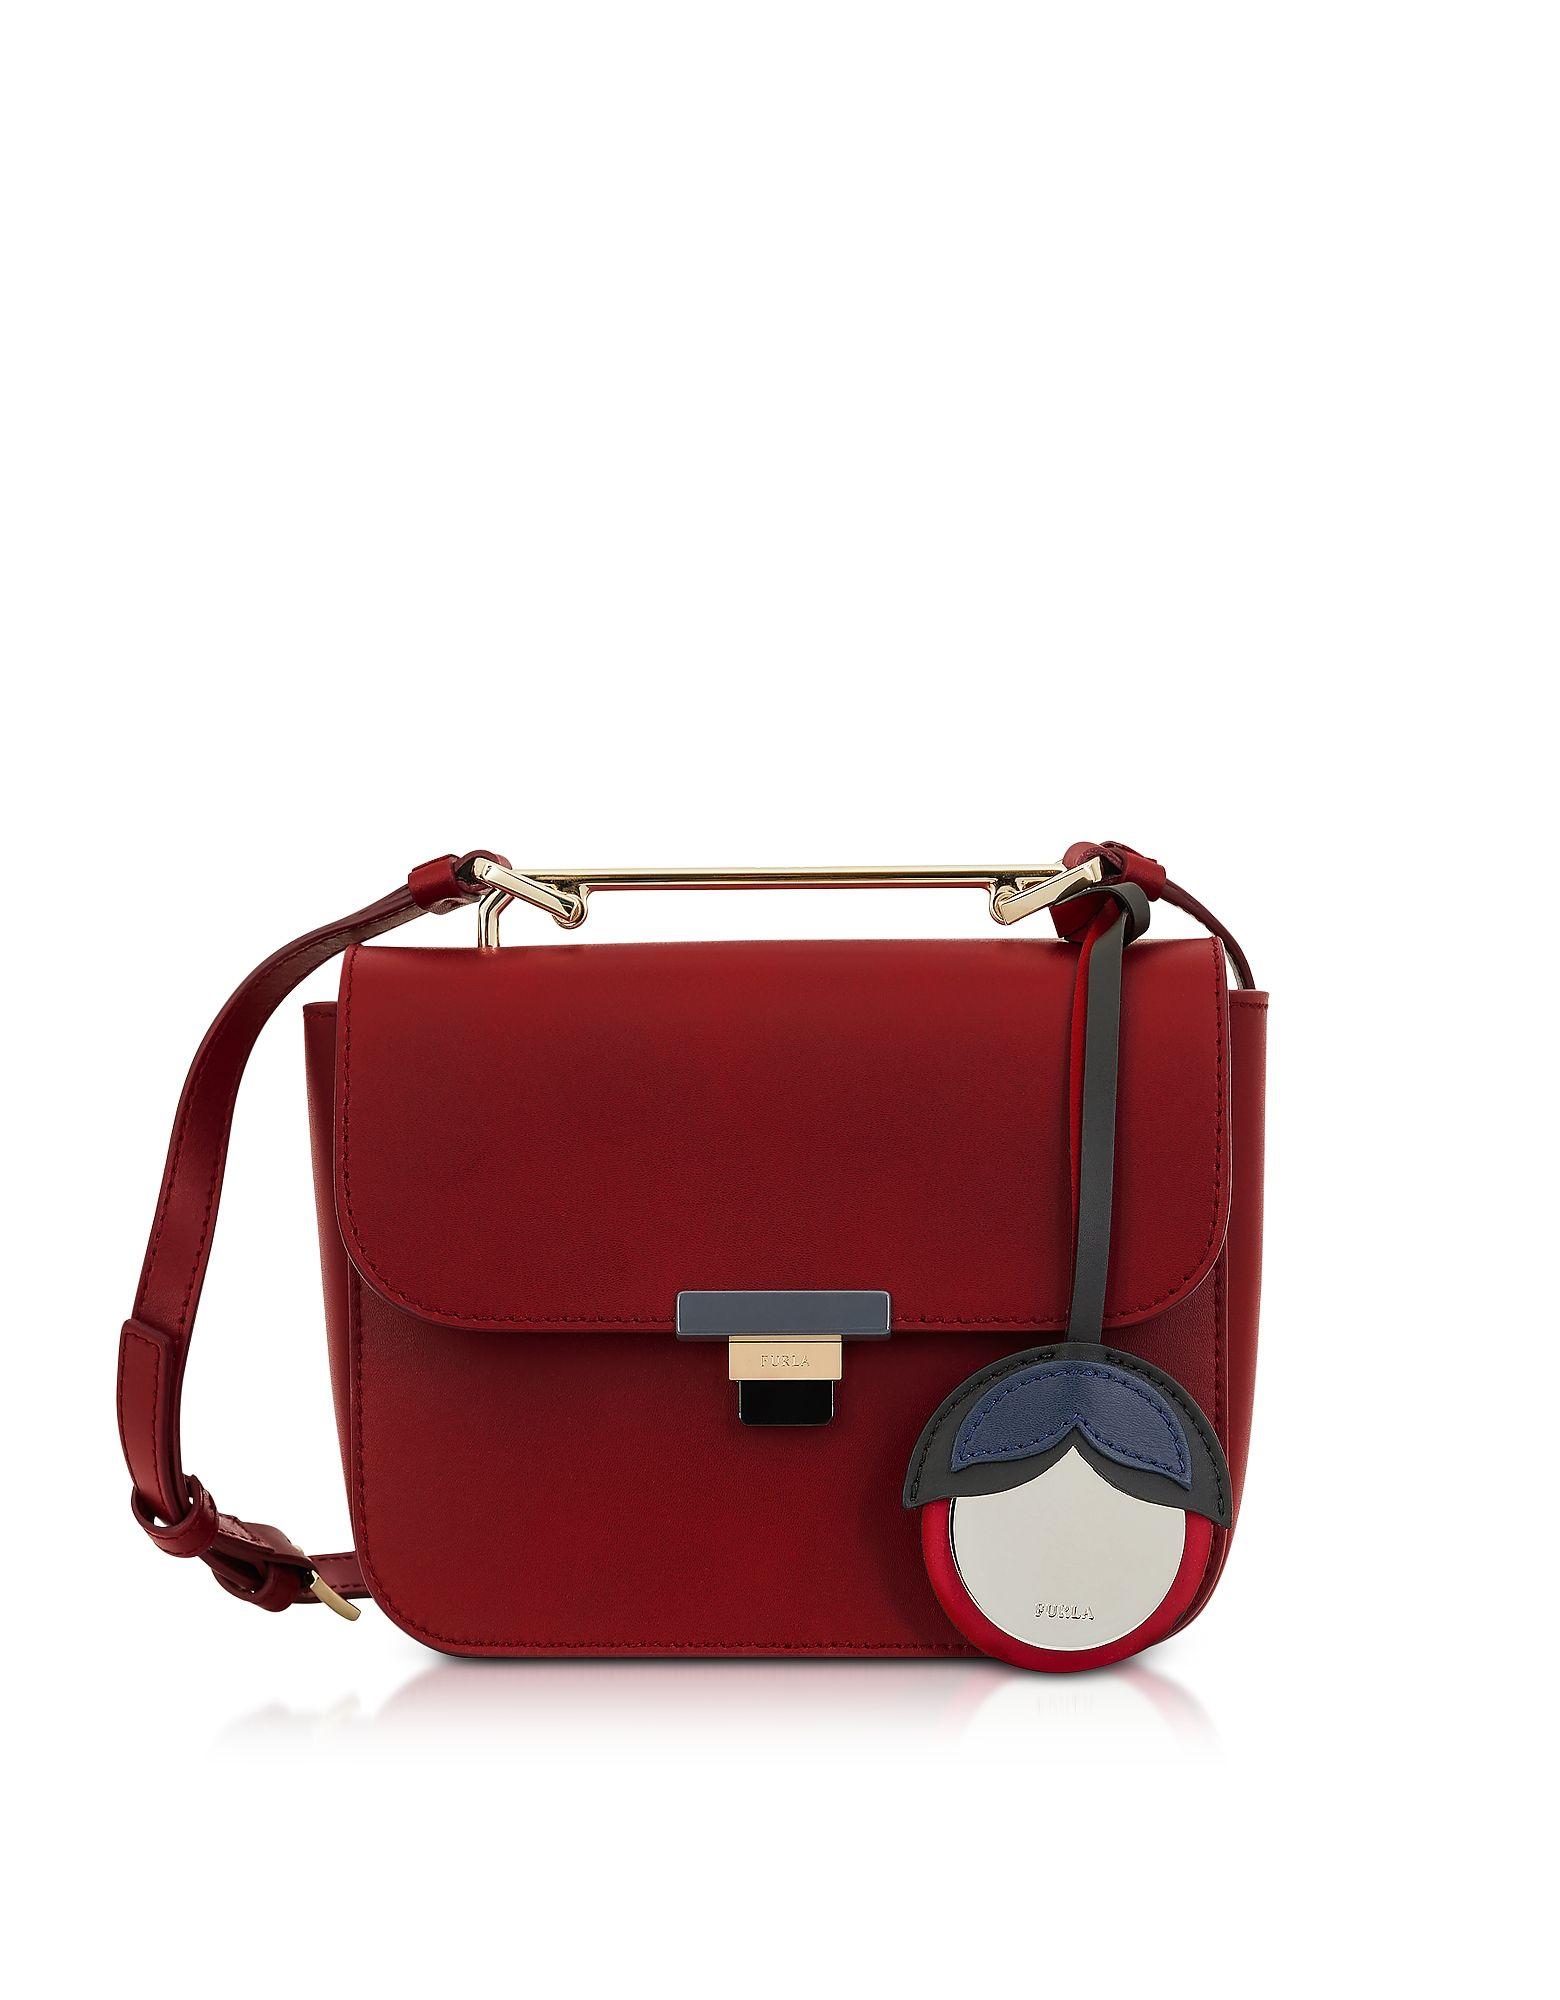 Elisir S Crossbody Bag in Cherry Calfskin Furla BaZGa2EL